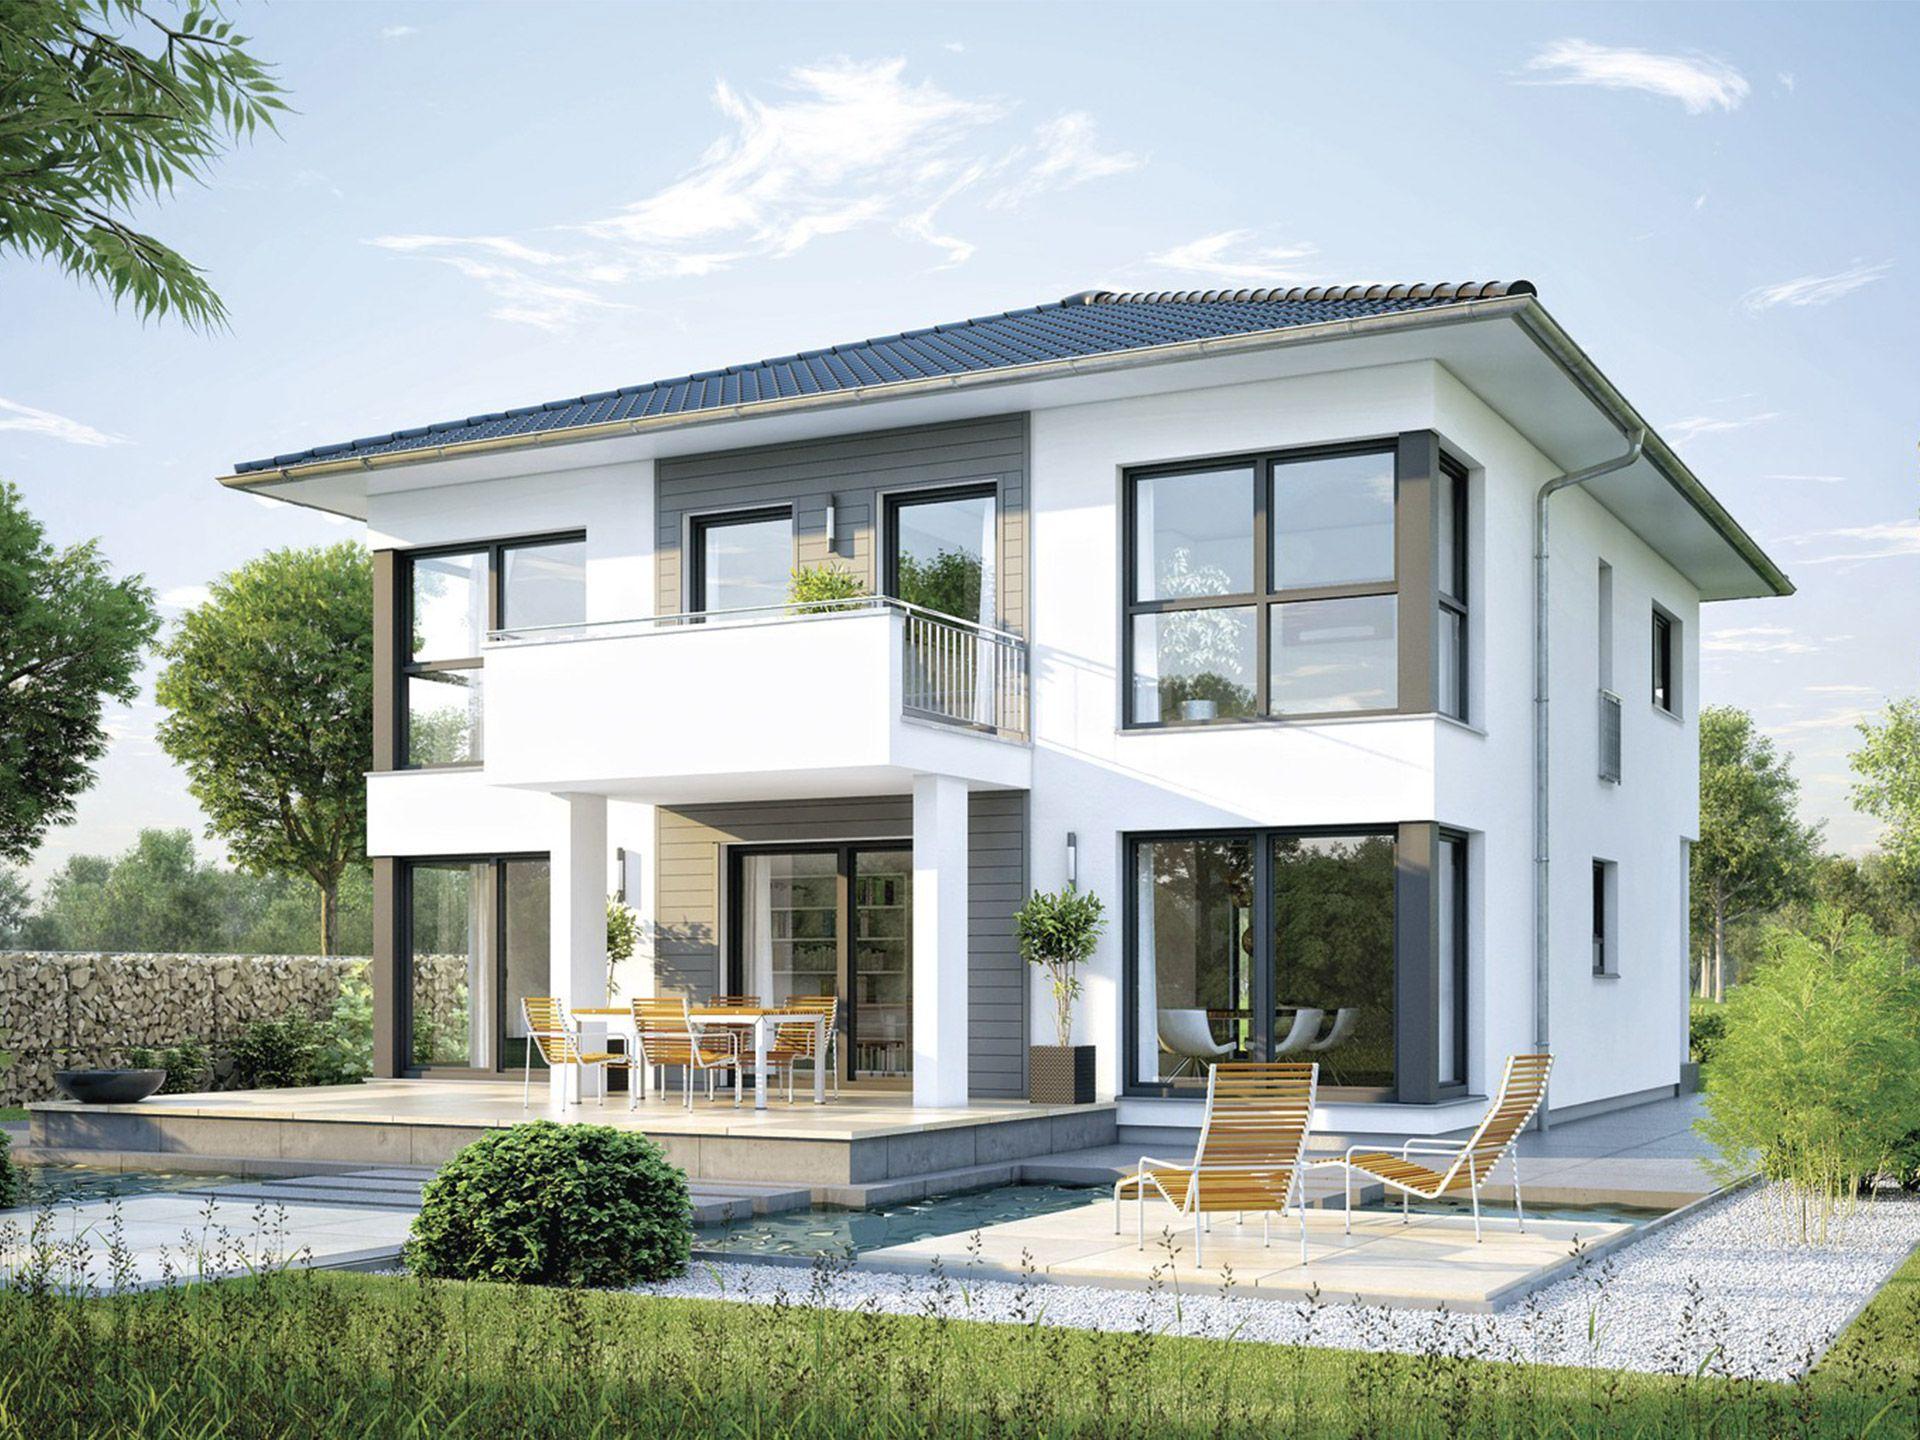 haus citylife 600 ausbauhaus von weberhaus. Black Bedroom Furniture Sets. Home Design Ideas